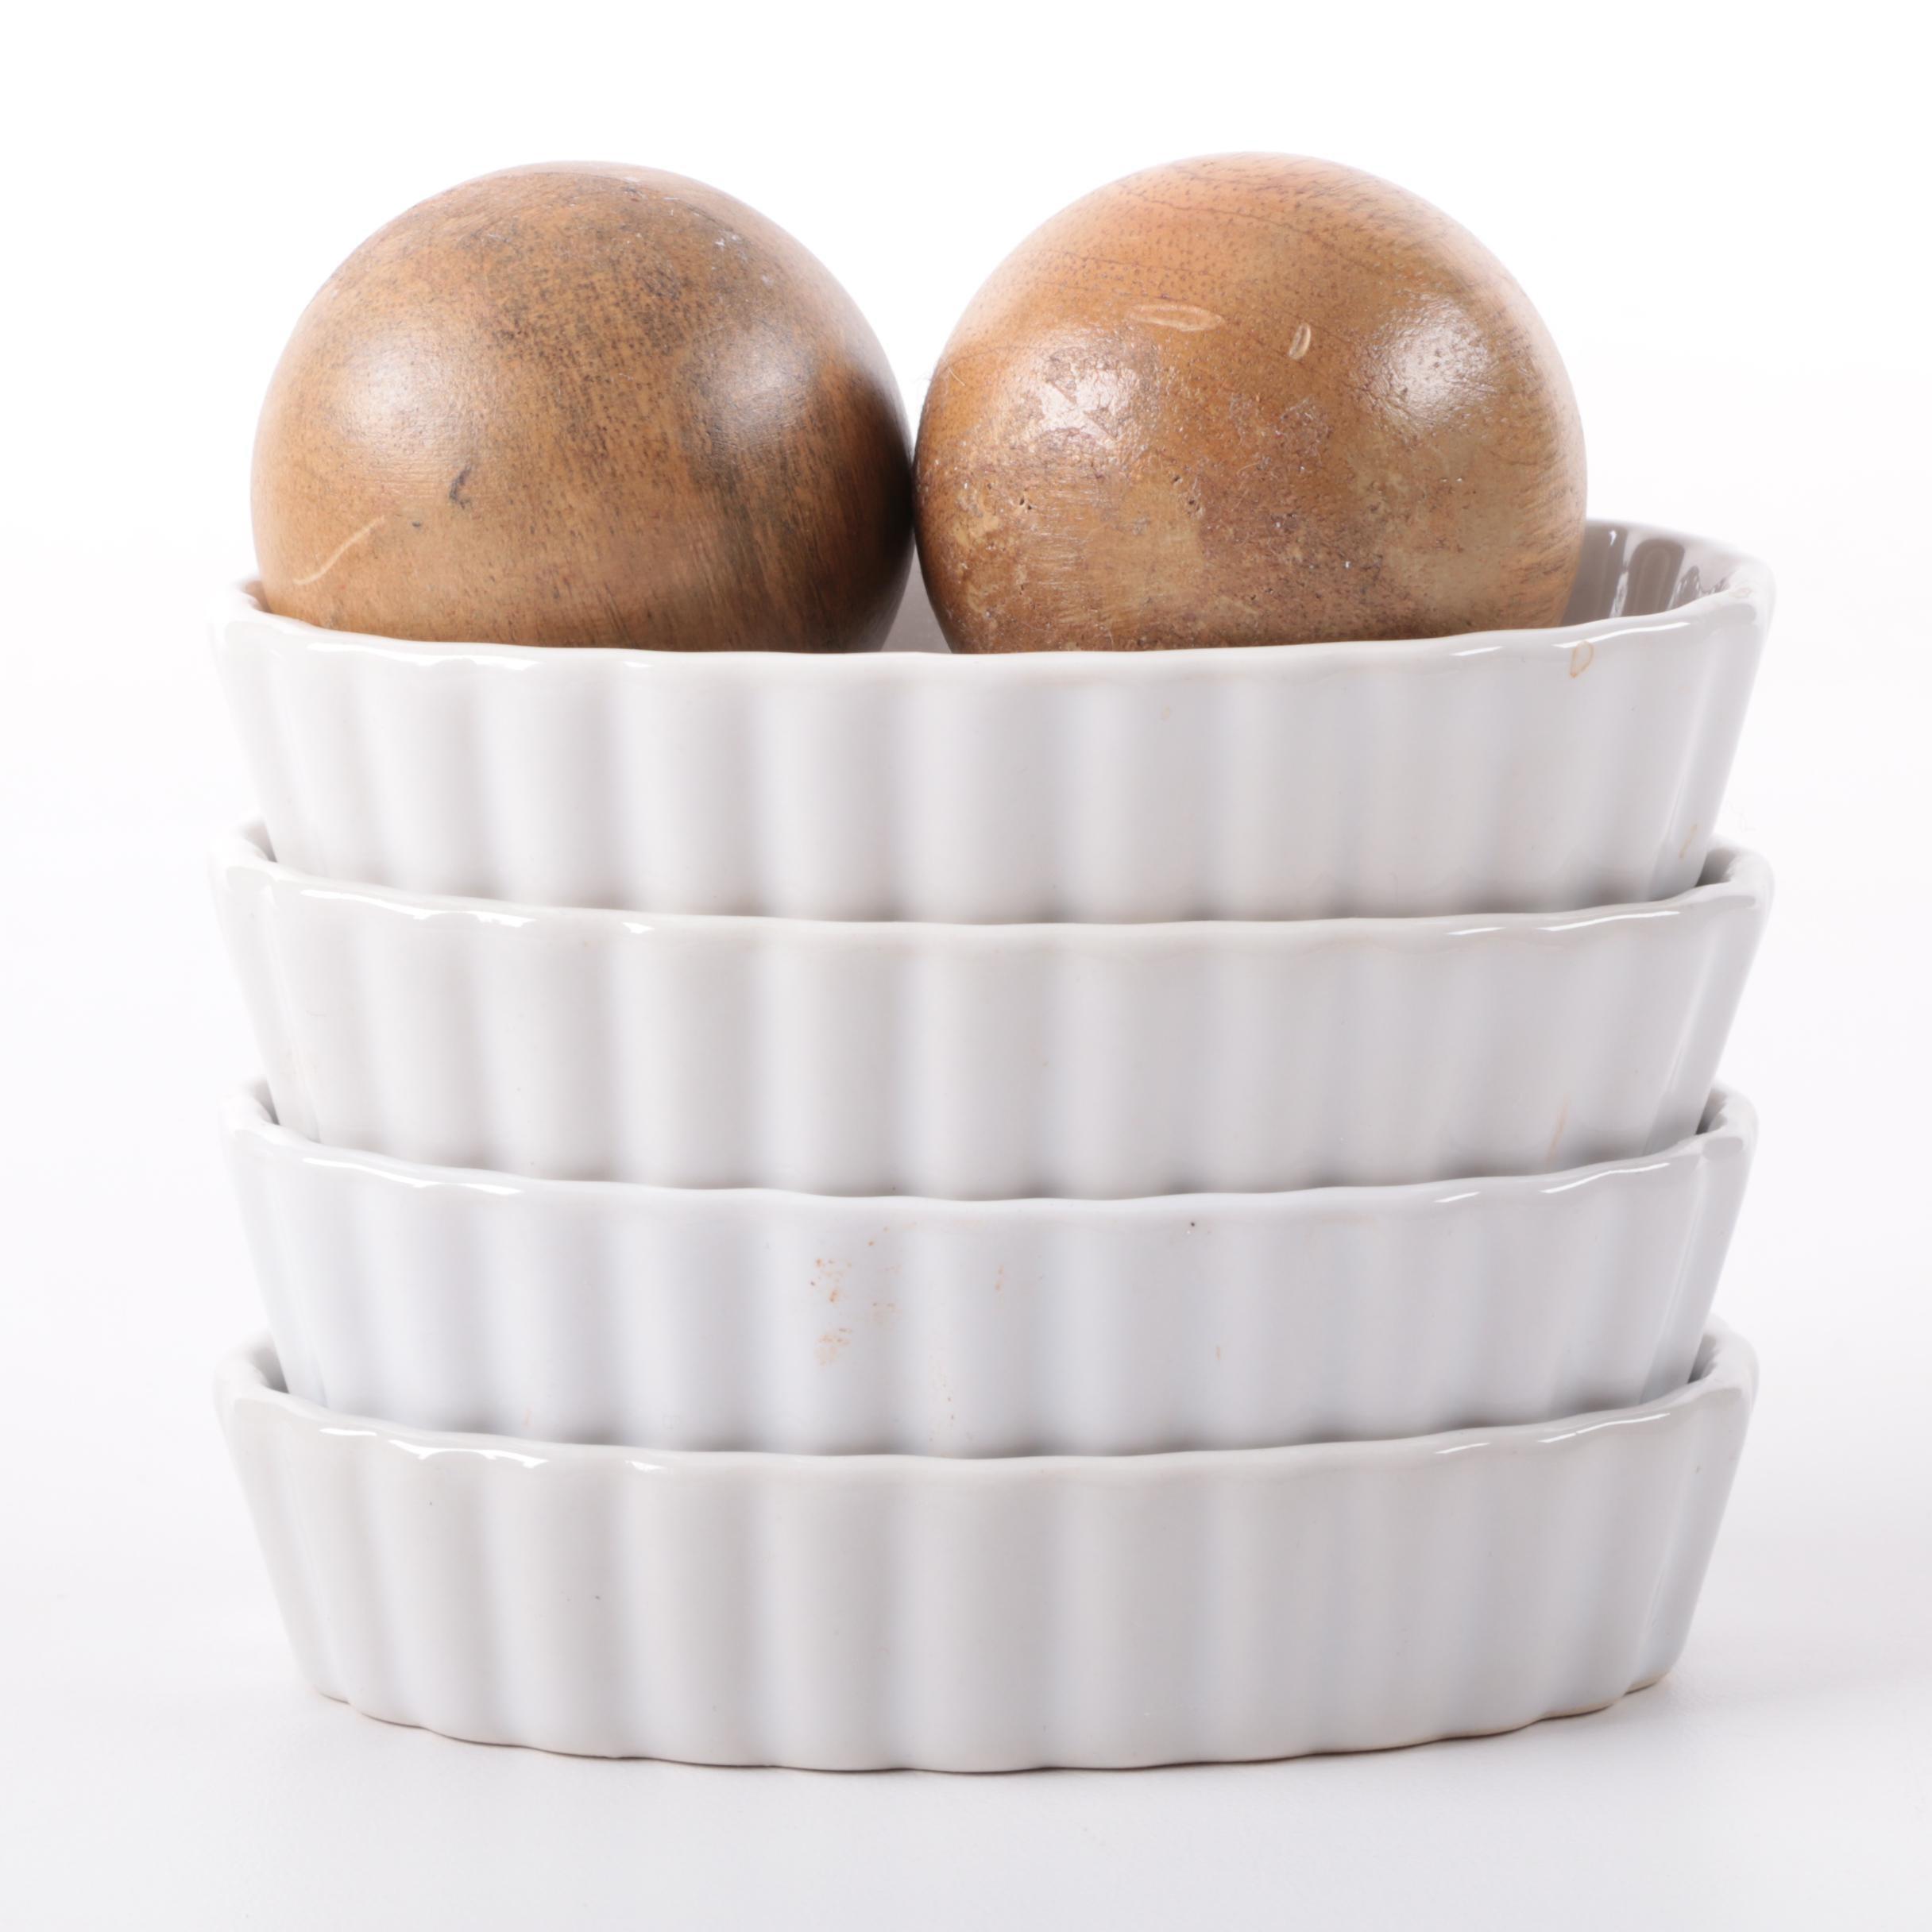 Oval Ramekins and Wooden Balls